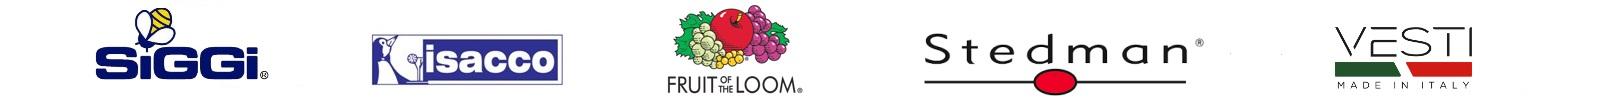 Abbigliamento-Siggi-Isacco-Fruit of the Loom-Stedman-Vesti